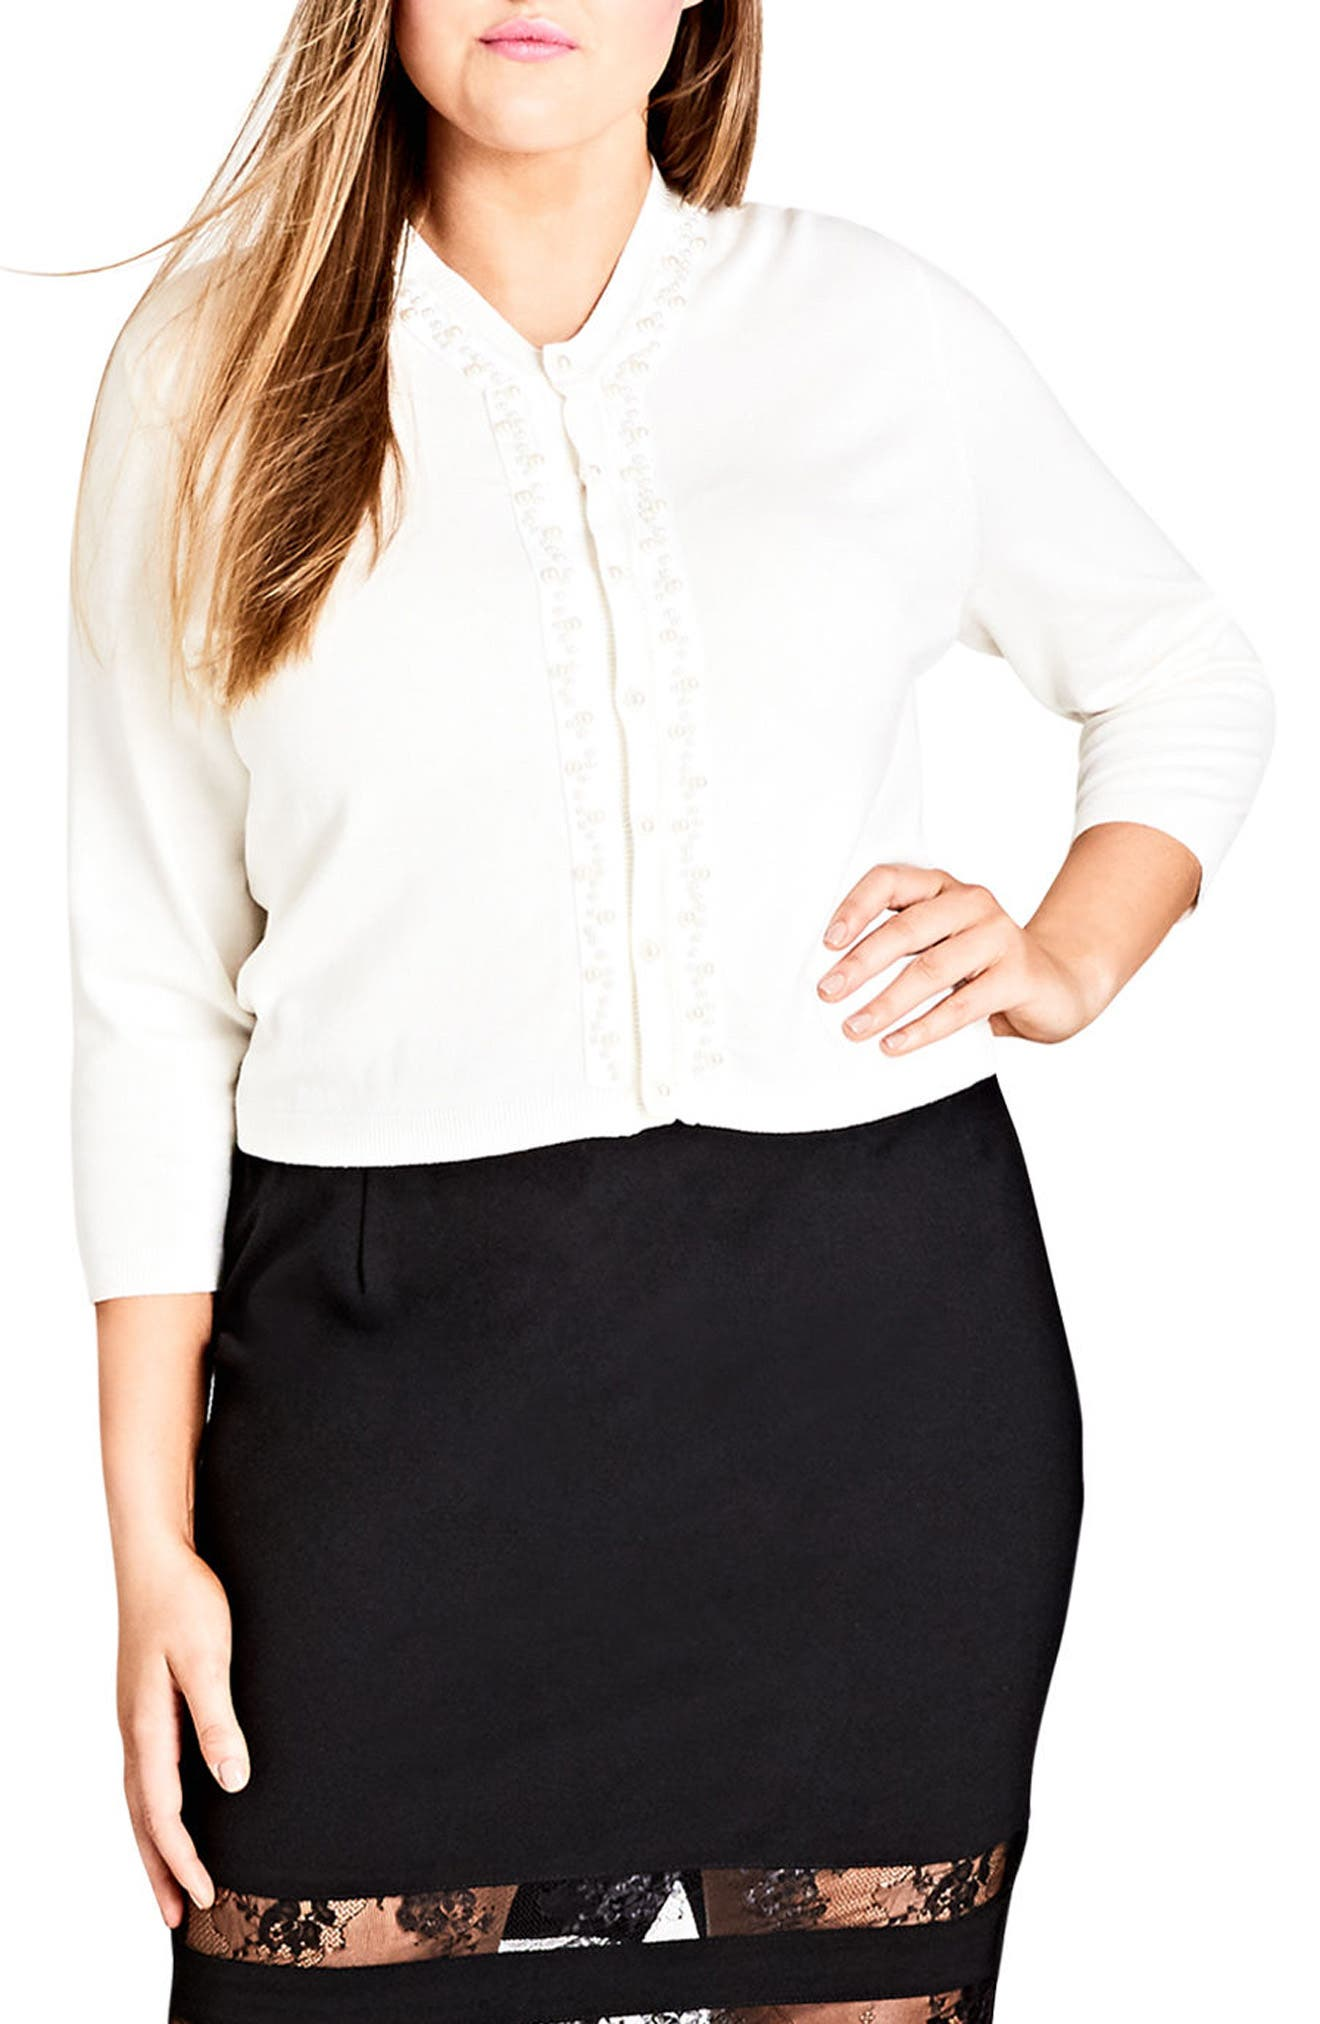 Main Image - City Chic Imitation Pearl Trim Cardigan (Plus Size)